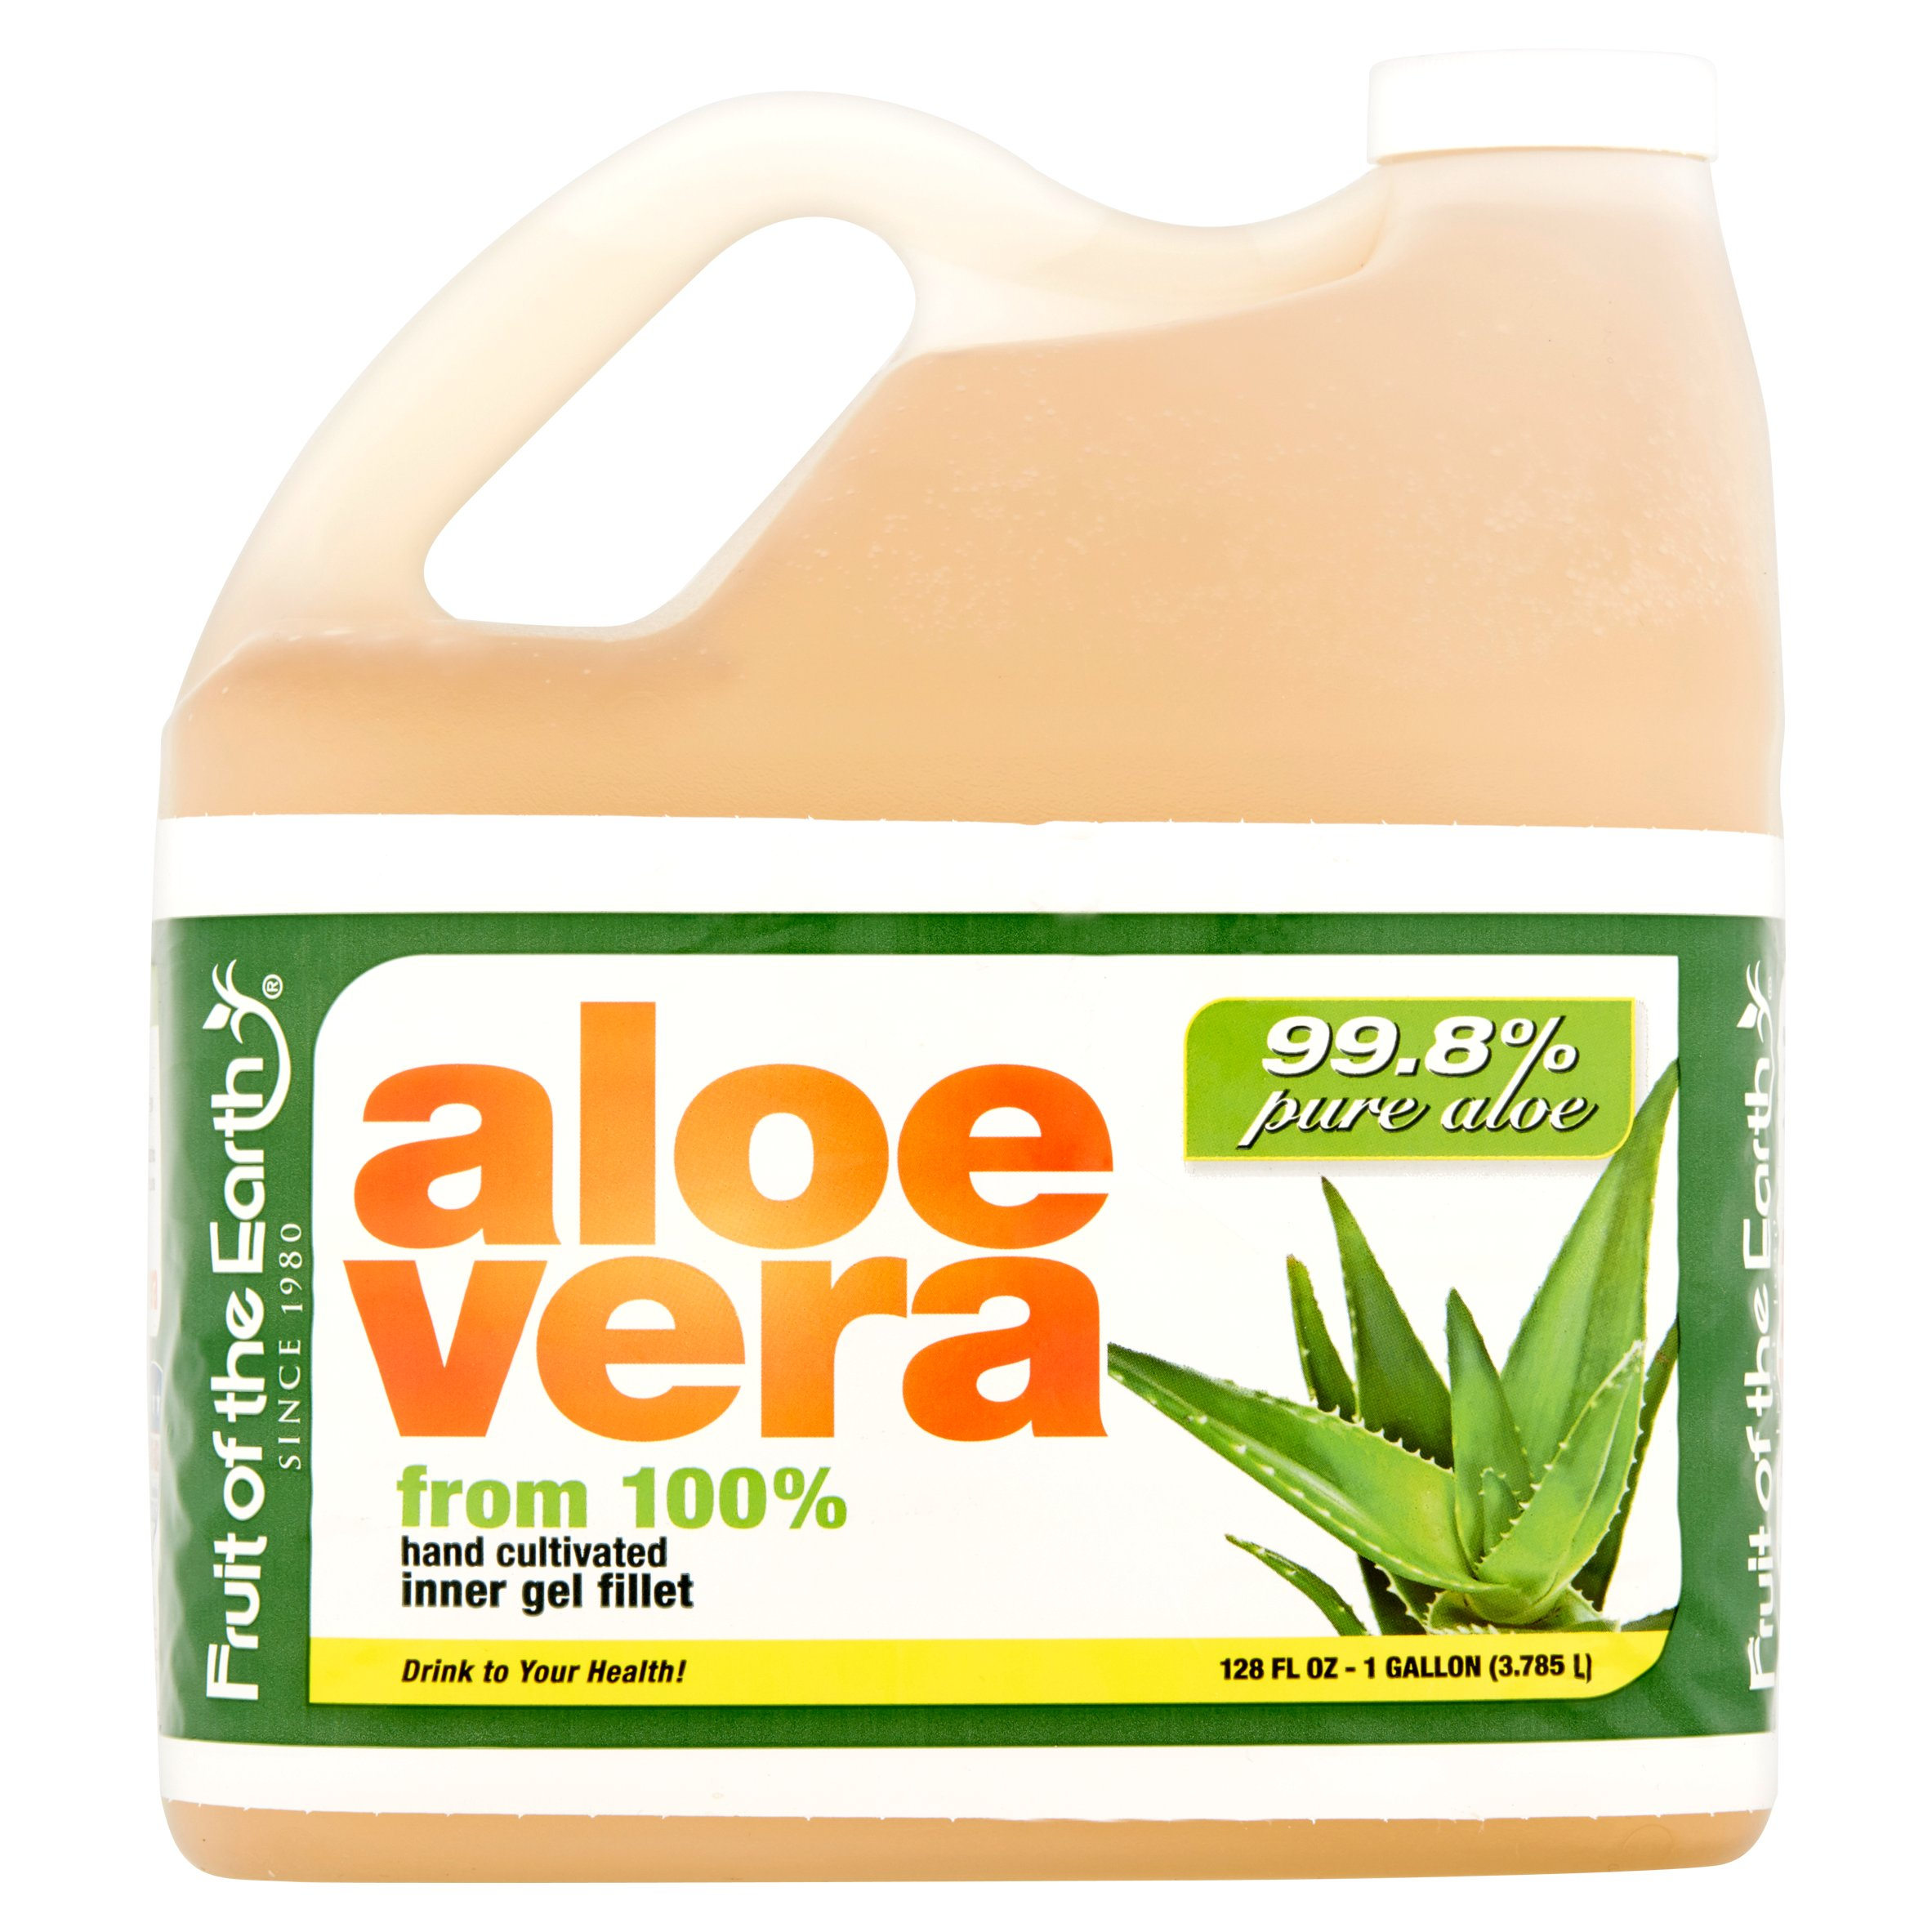 fruit of the earth aloe vera juice dehydrated fruit